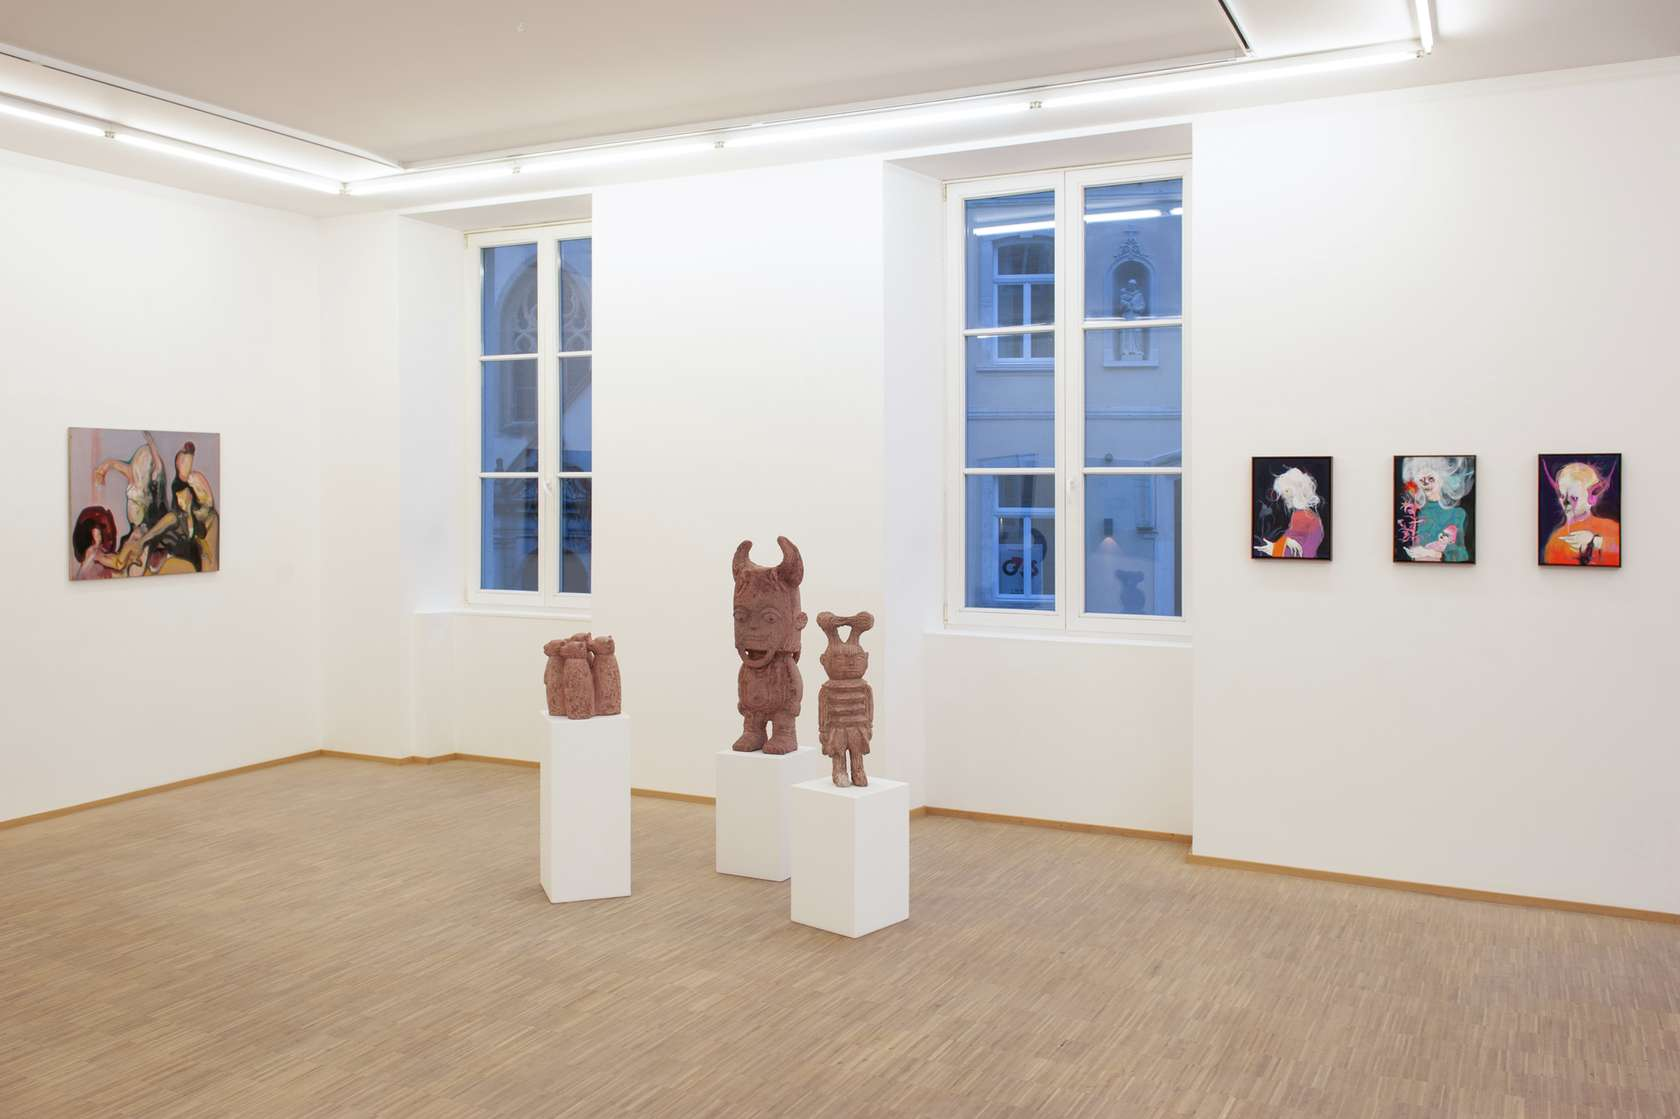 Stefan Rinck Just So Stories Nosbaum Reding Gallery, Luxembourg (LX) 28 novembre 2019 — 18 janvier 2020